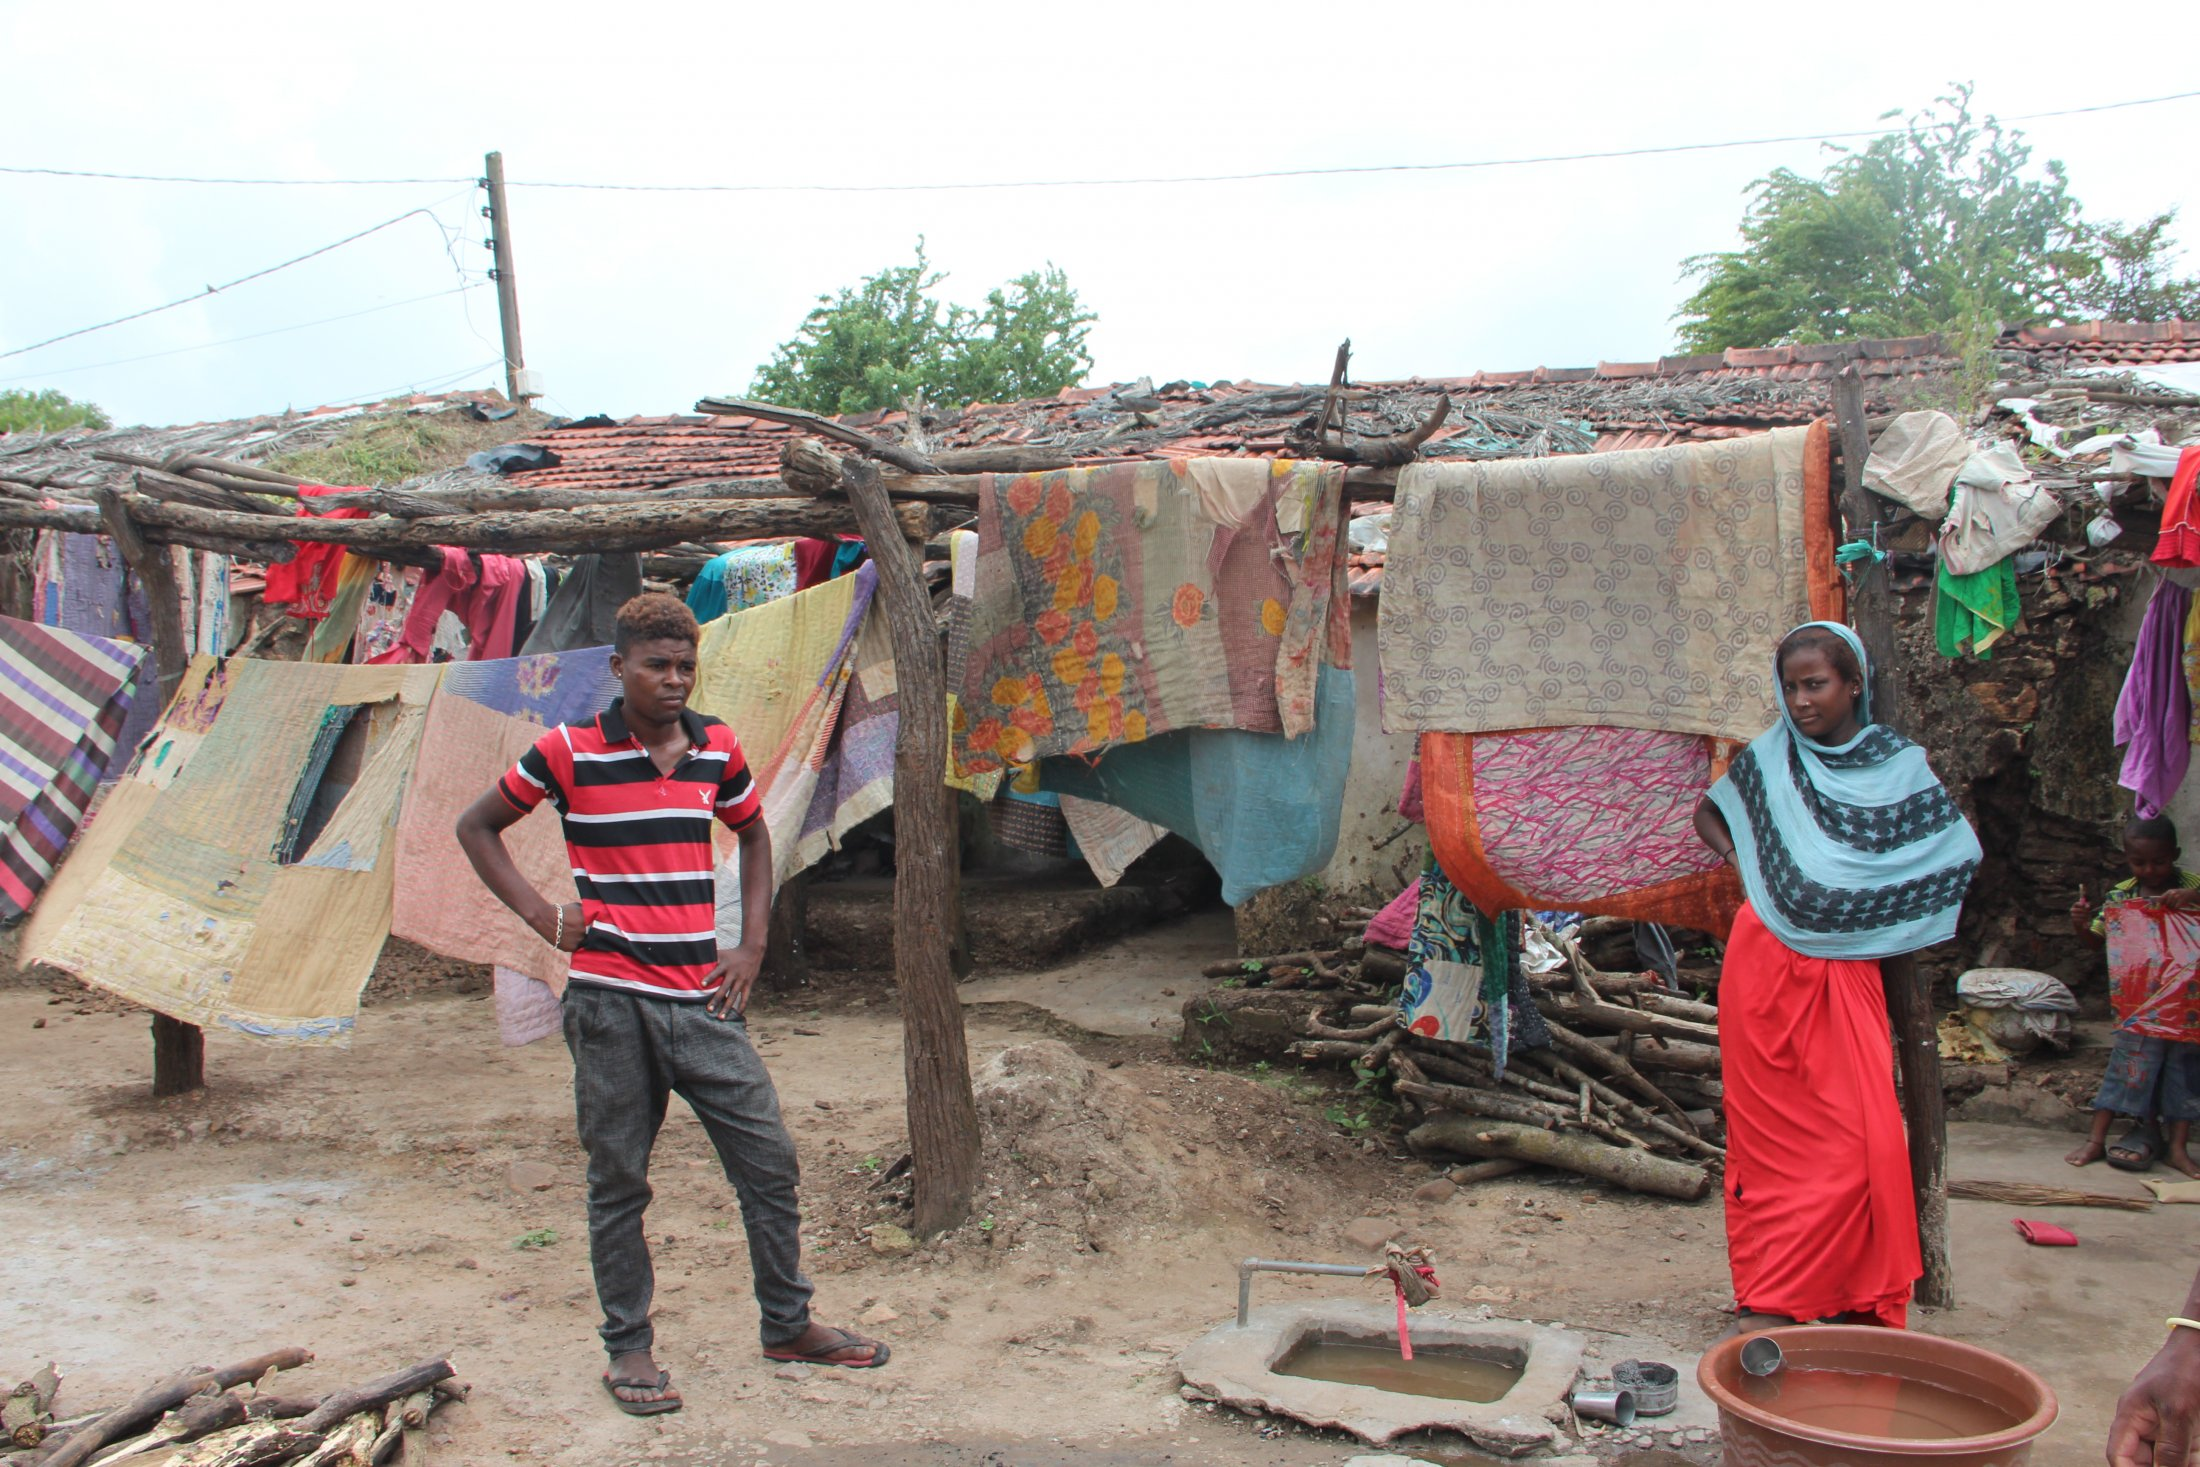 A Row of Small Sidi Houses, Gujarat